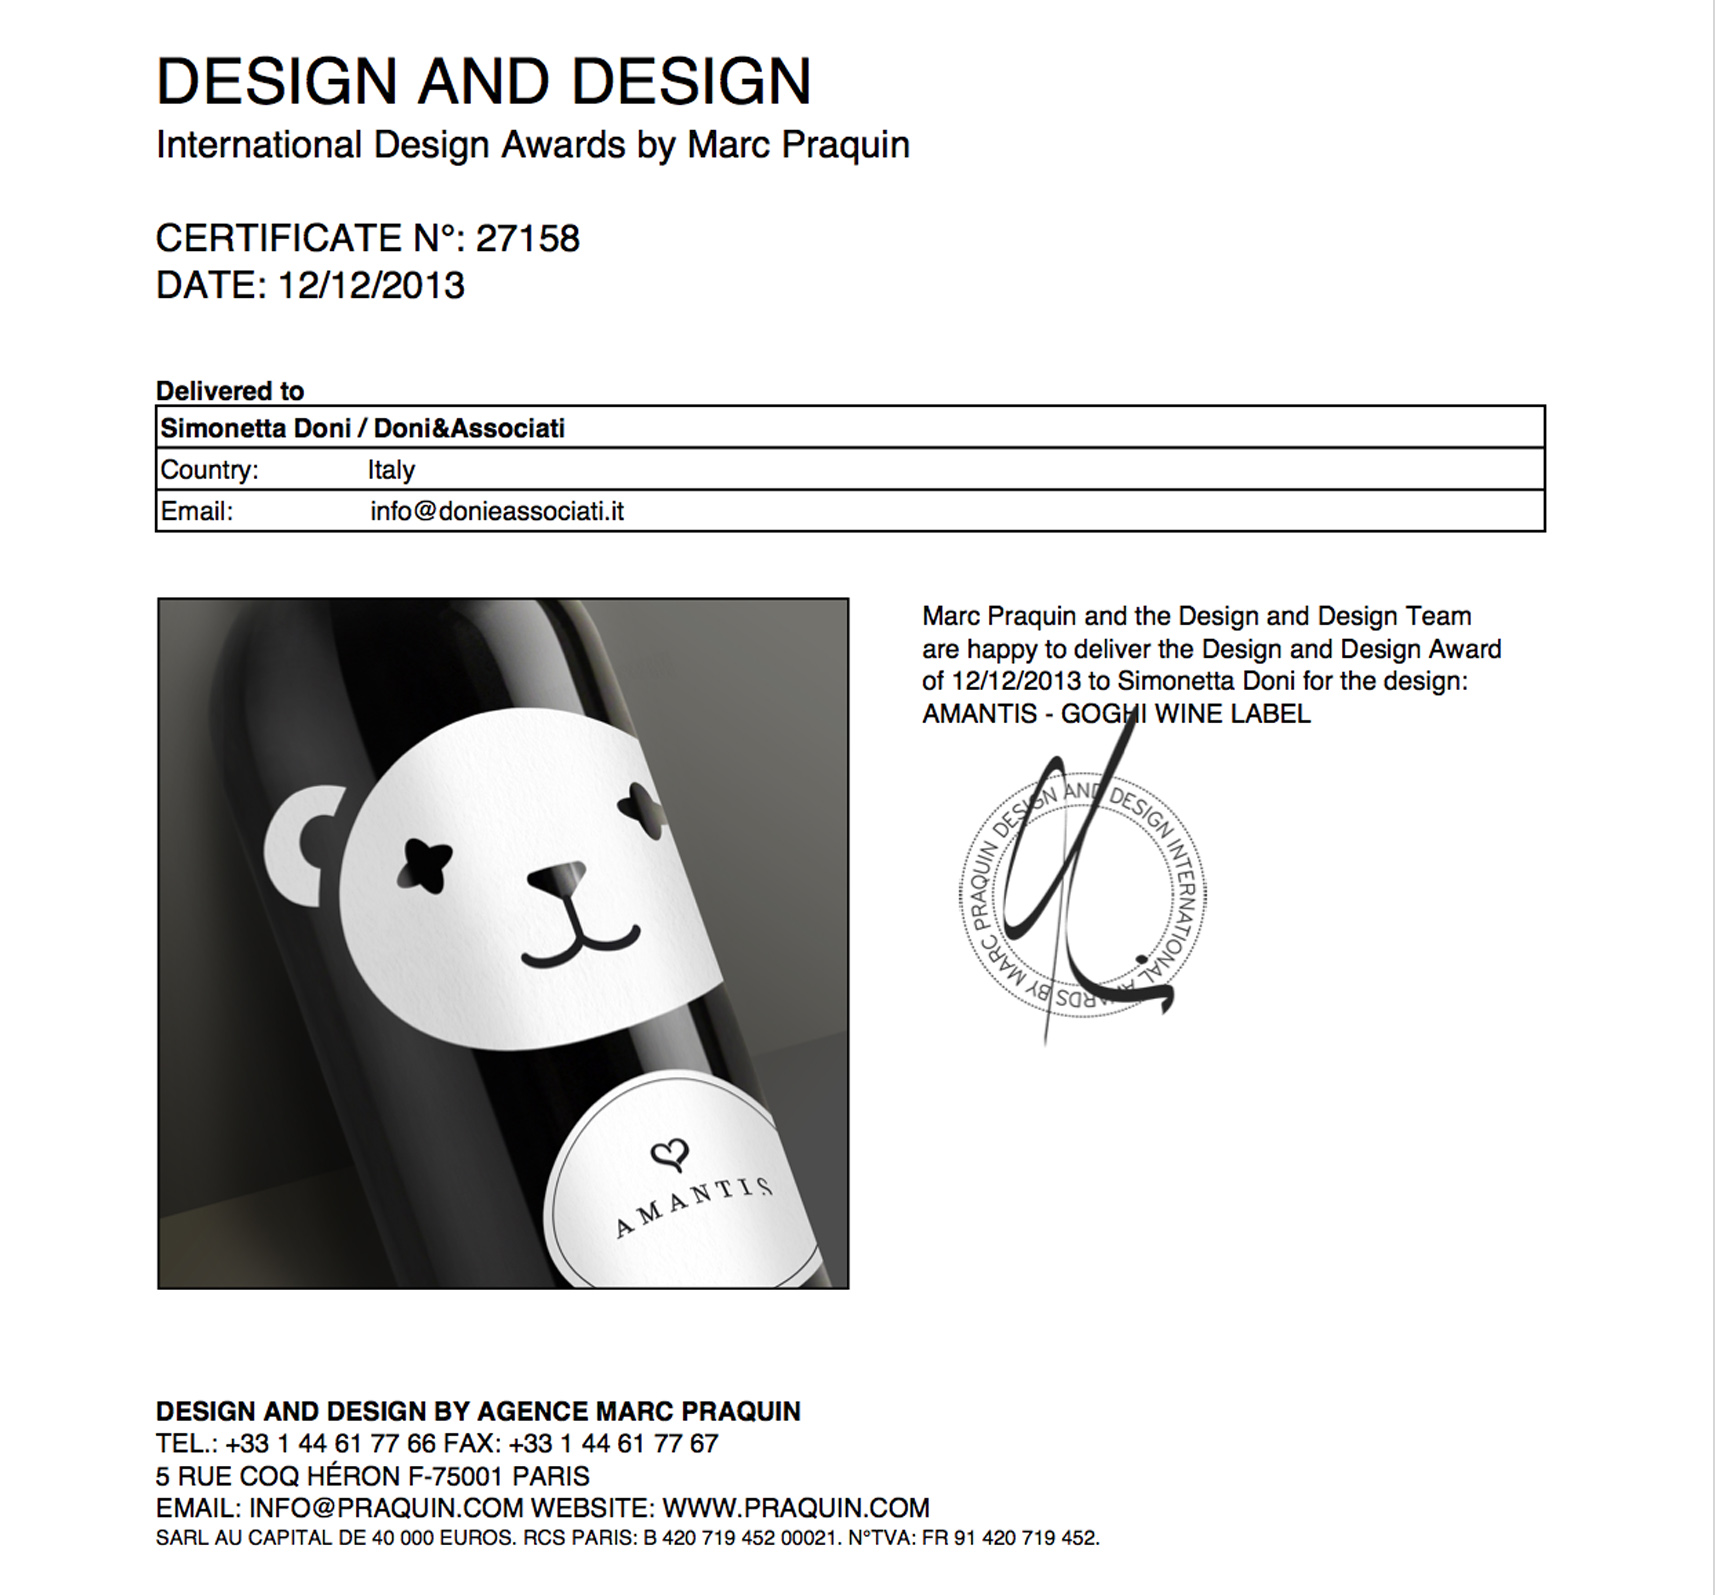 doni-design-goghi-amantis-award-2013